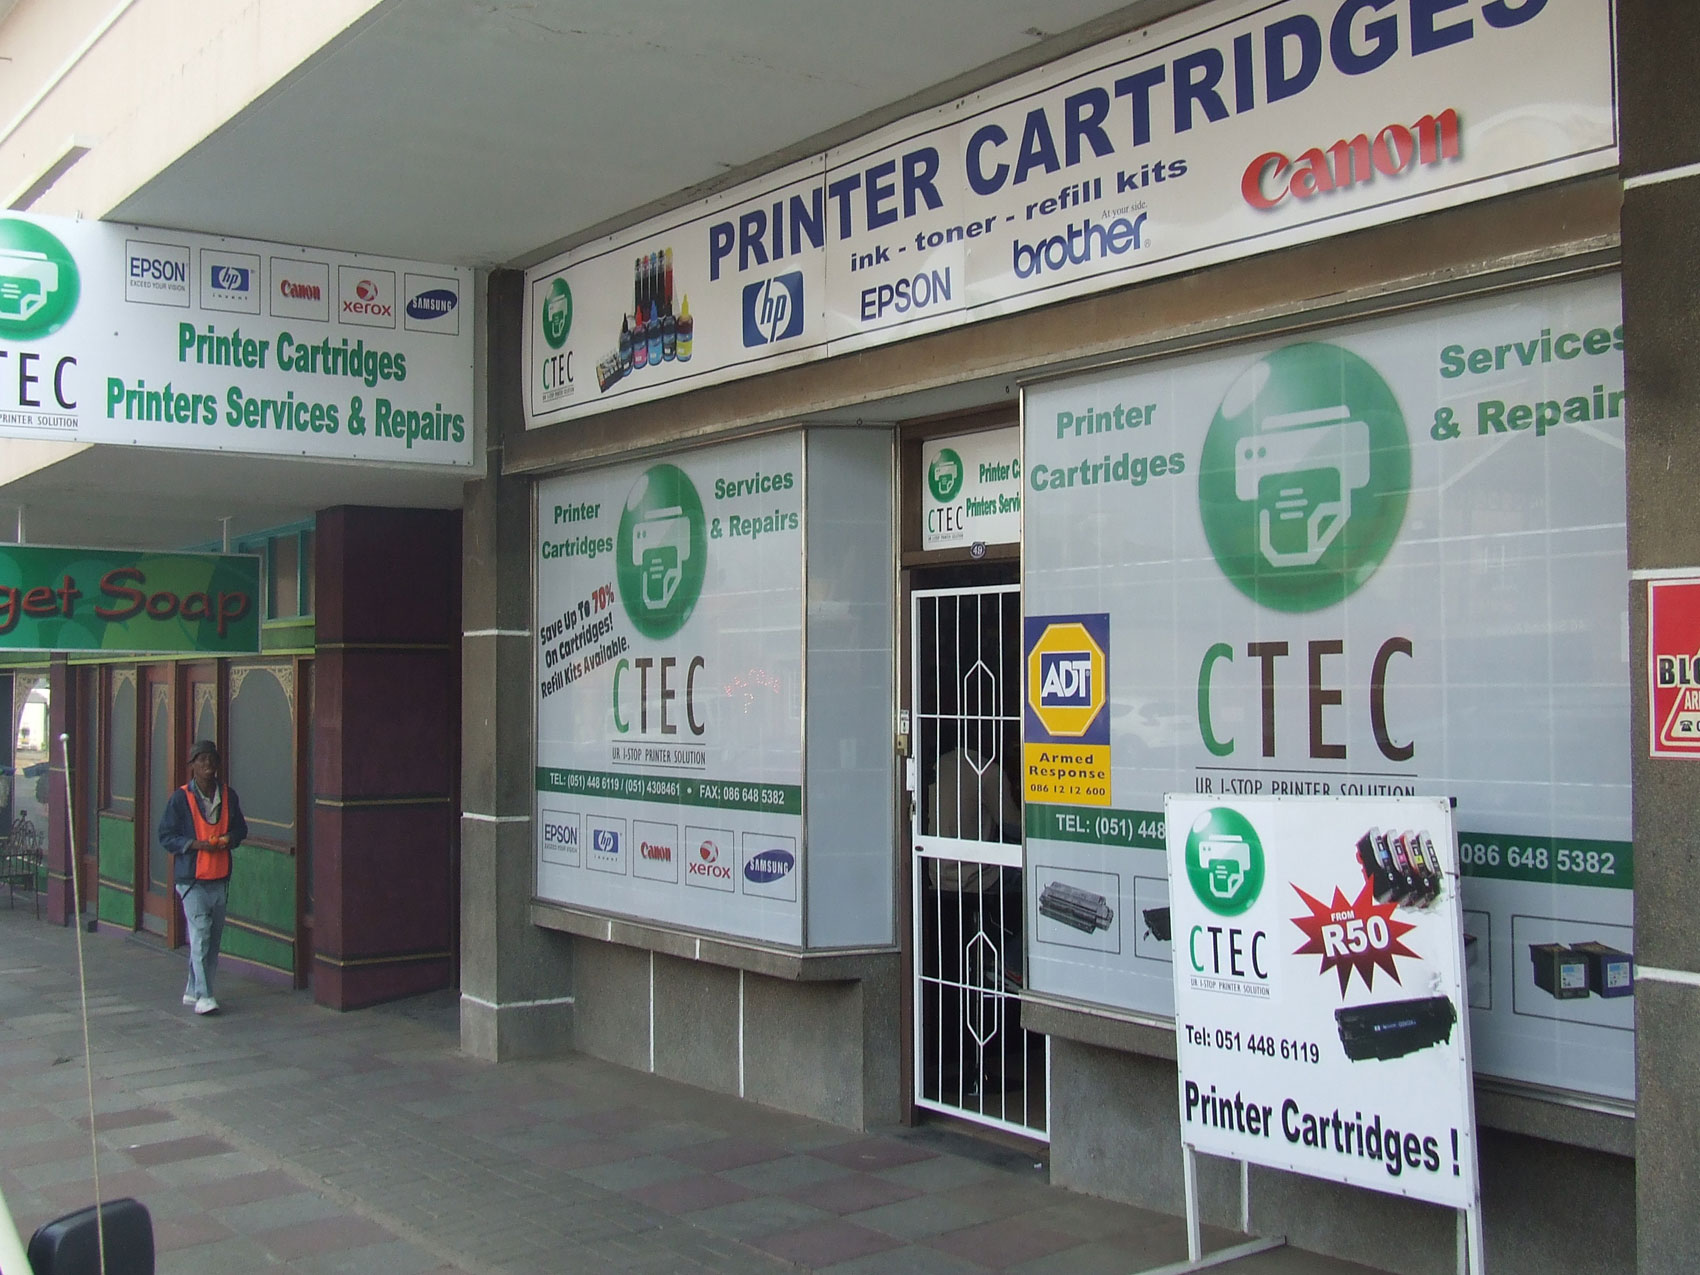 CTEC Bloemfontein. Printer Cartridge Supplier